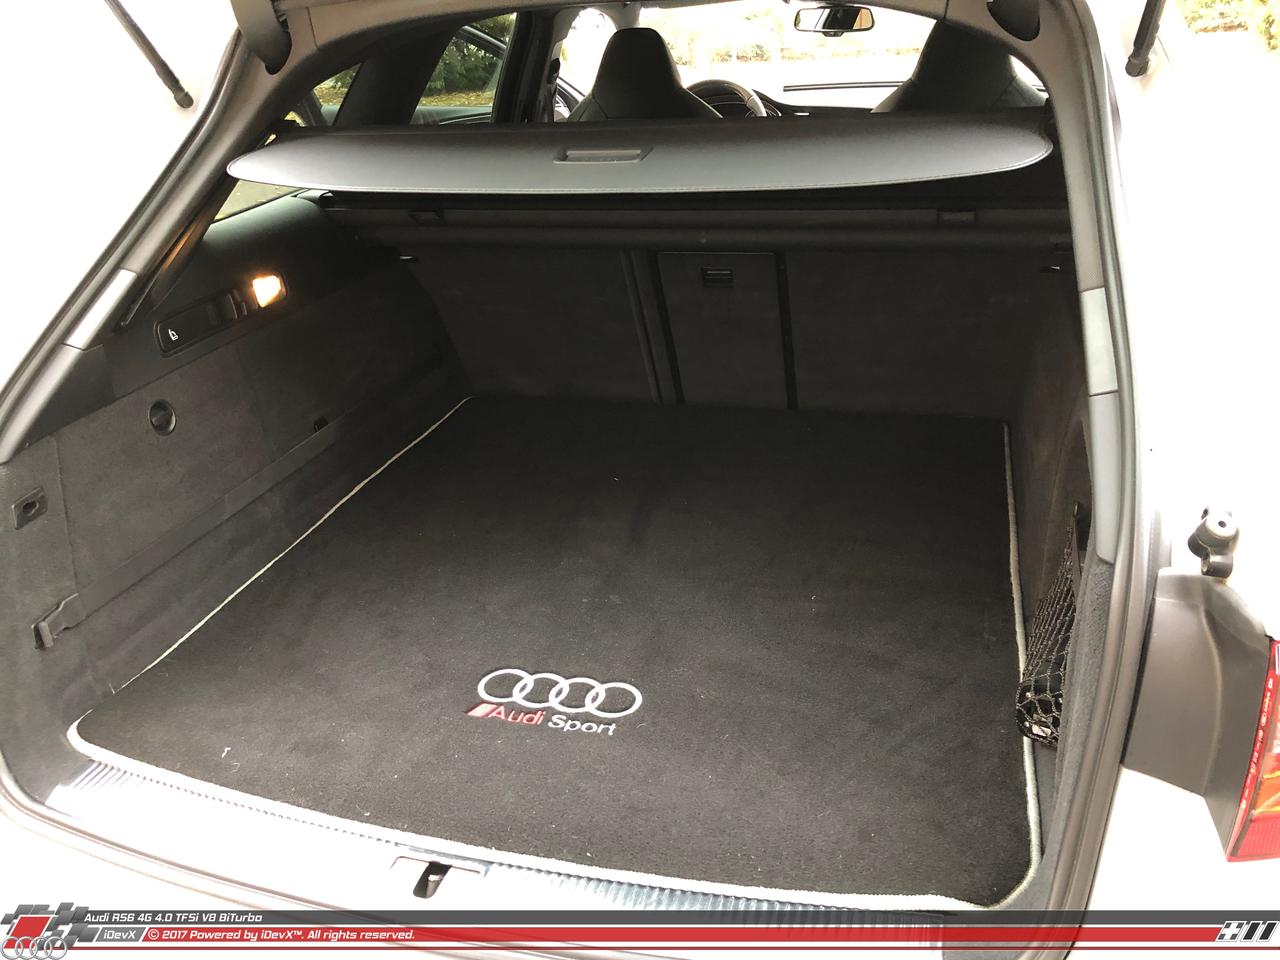 10_11.2018_Audi-RS6_iDevX_005.png